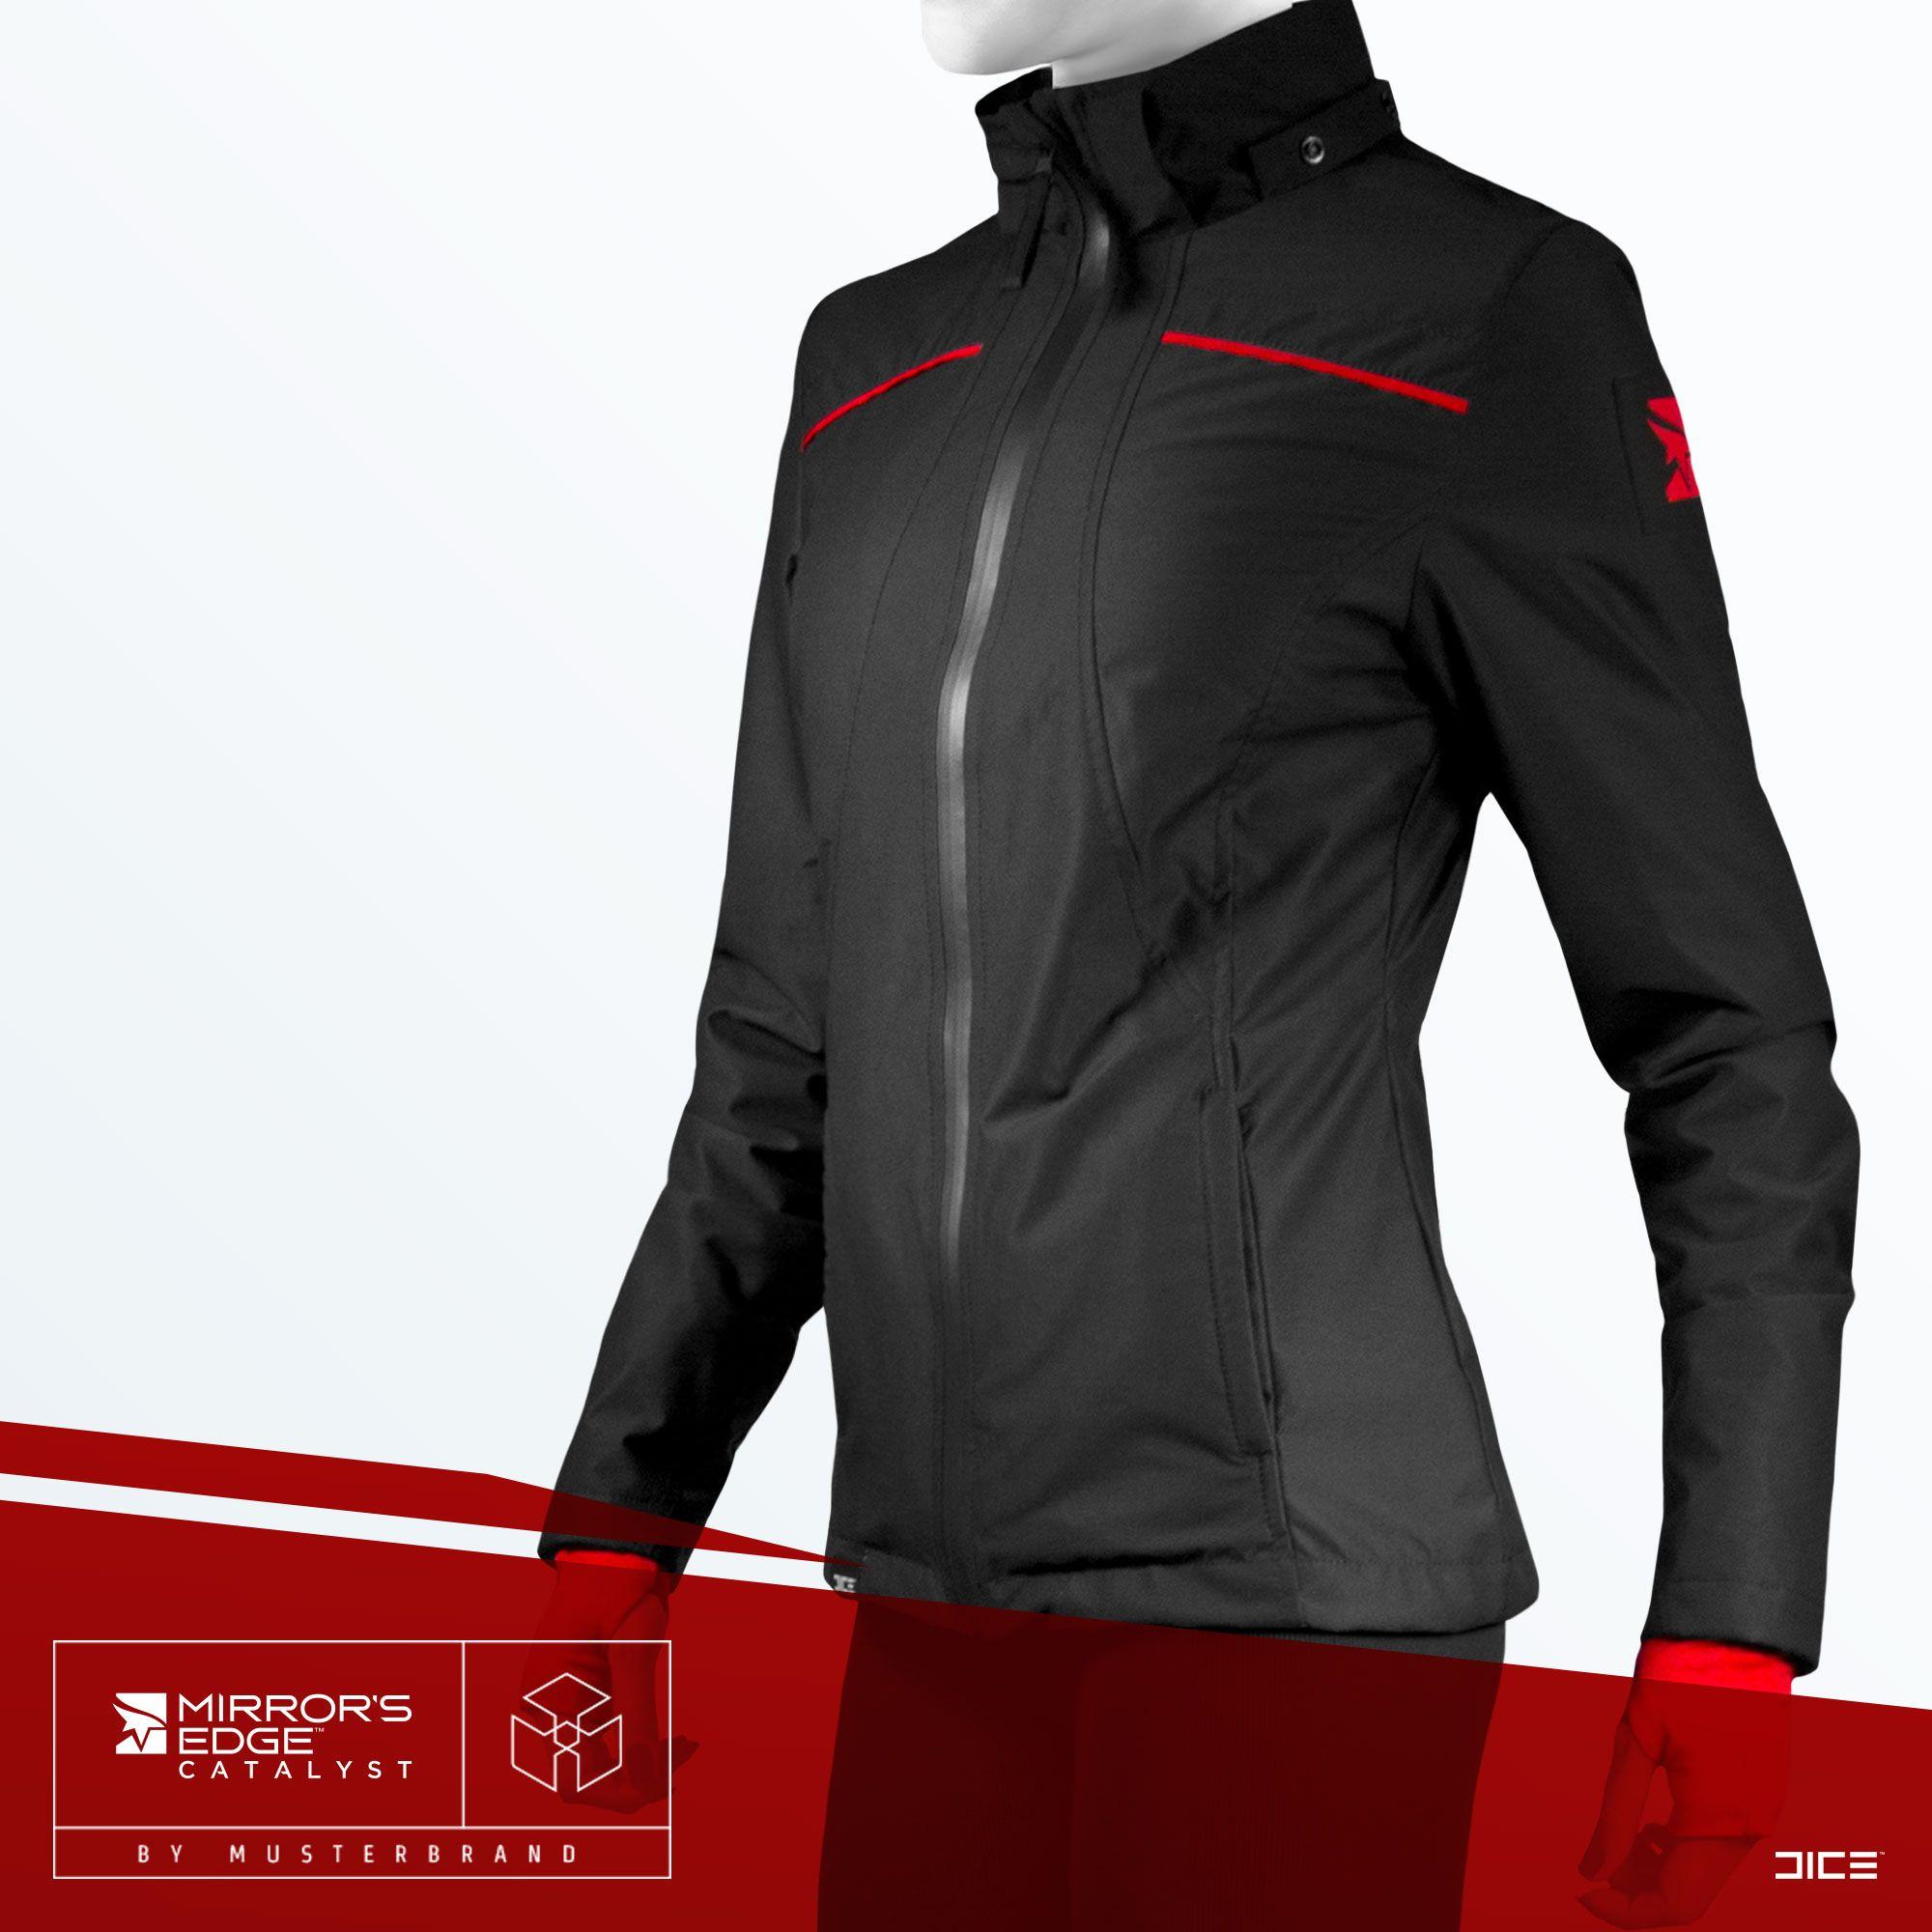 Shirt jacket design - The Faith Jacket Functional Female Free Runner Jacket Based On The Design Of Mirror S